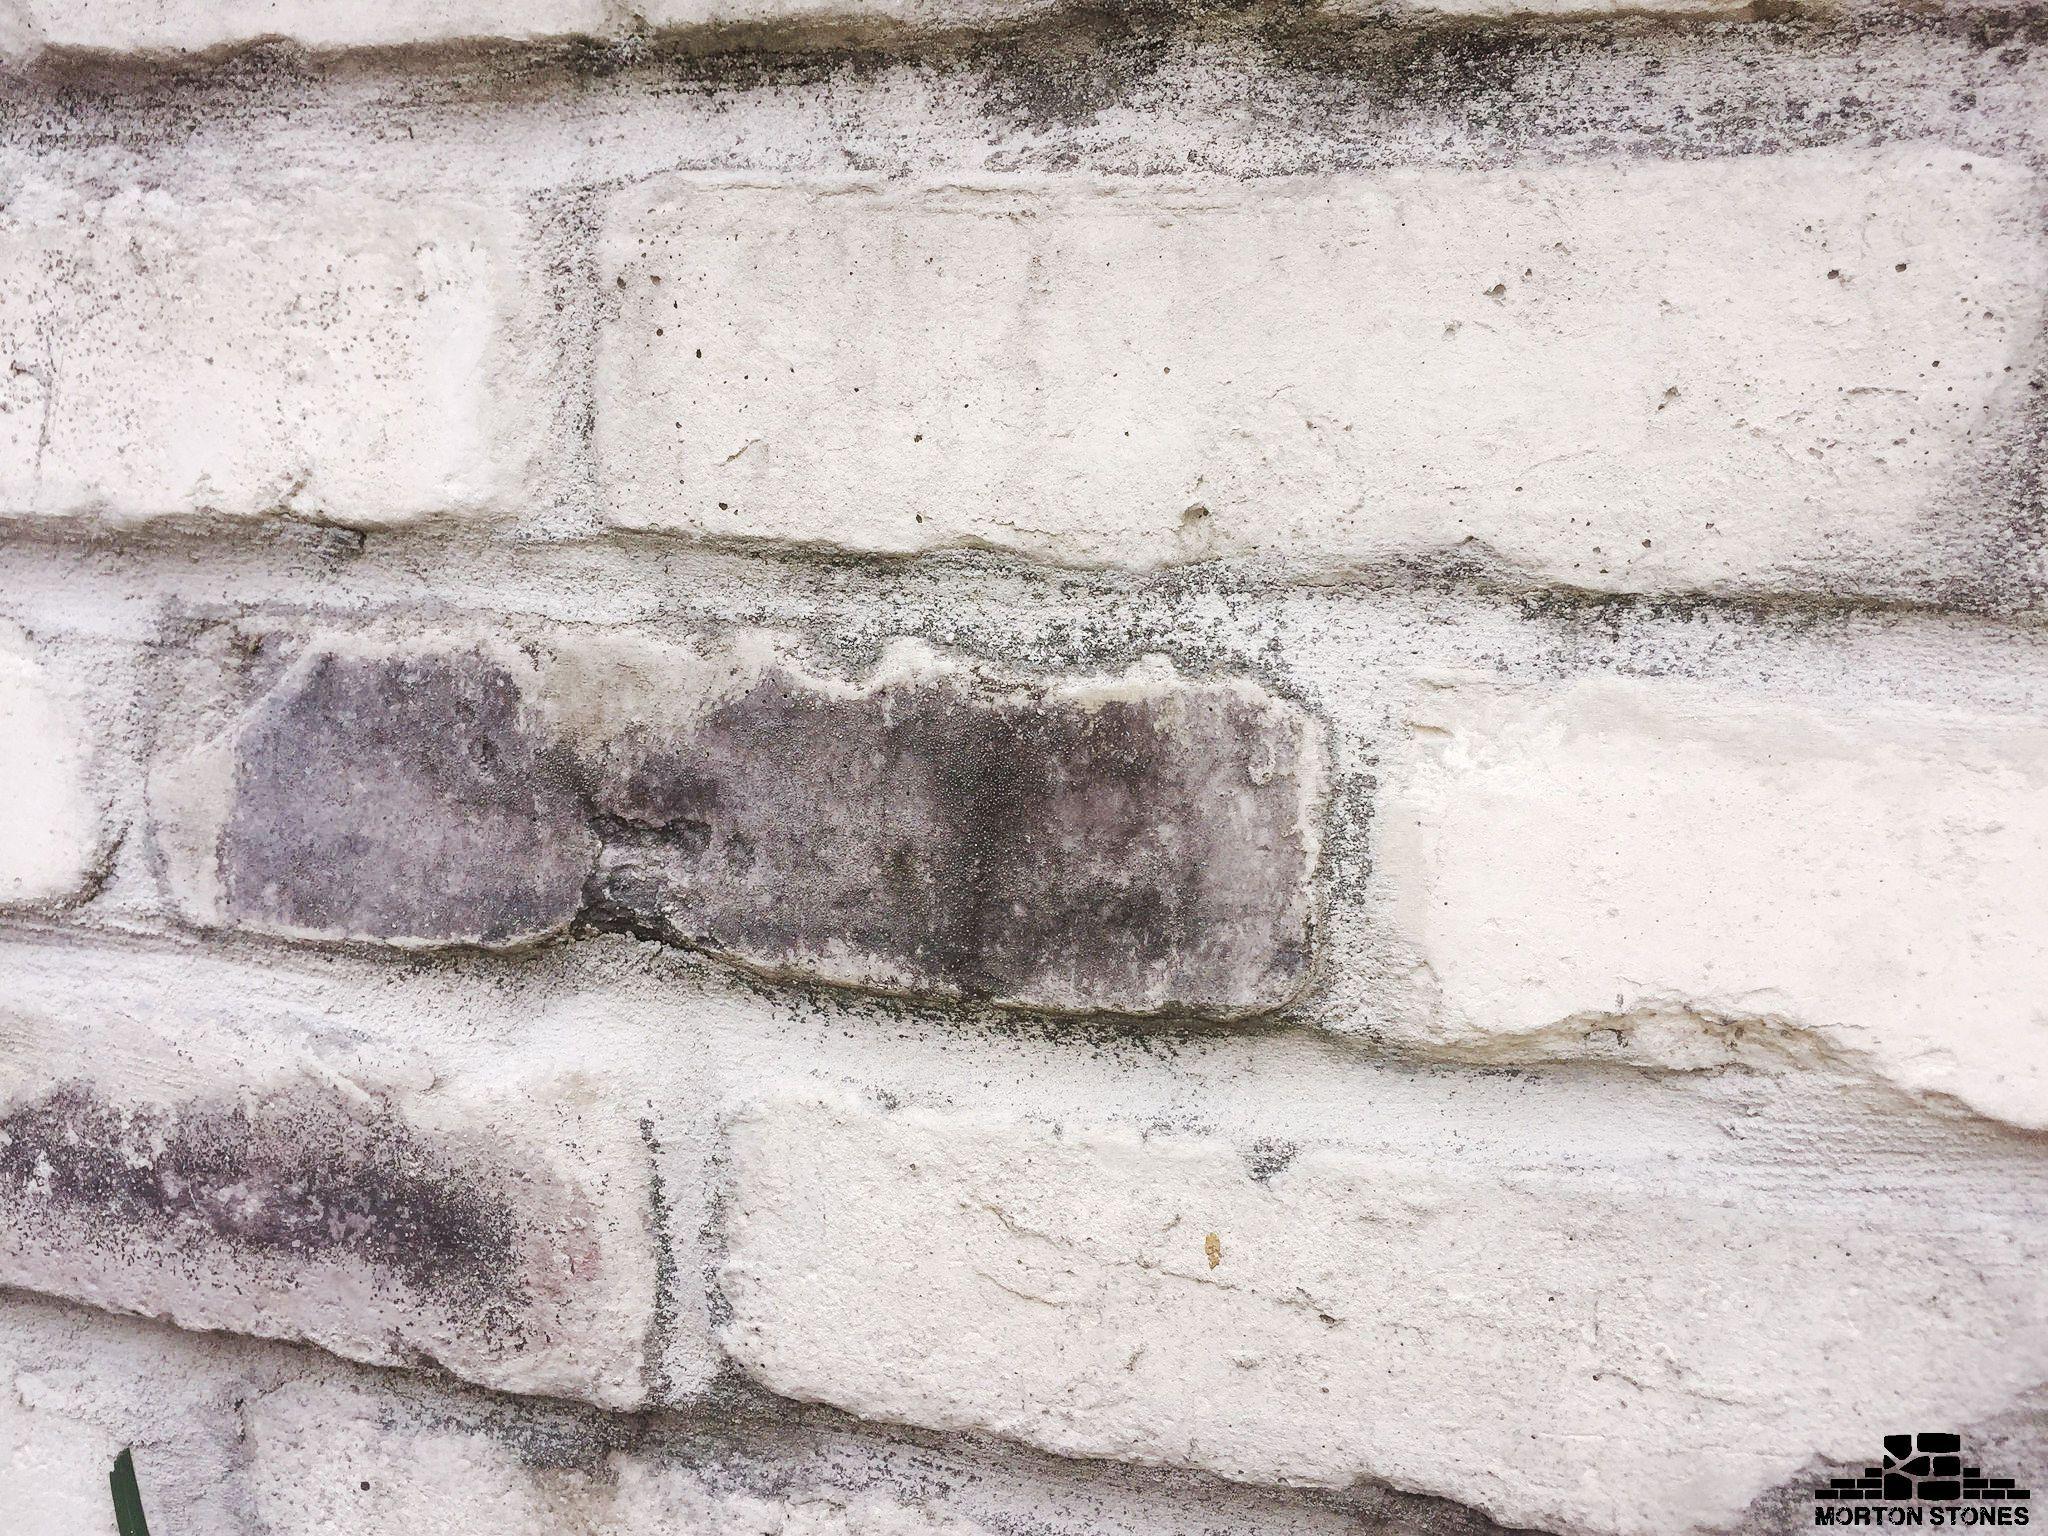 The Whitewashed Brick Accent Wall Adds An Elegant Rustic Vibe Mortonstones Brick Tiles Rustic Thinbrick Brick Veneer Brick Decor White Brick Backsplash